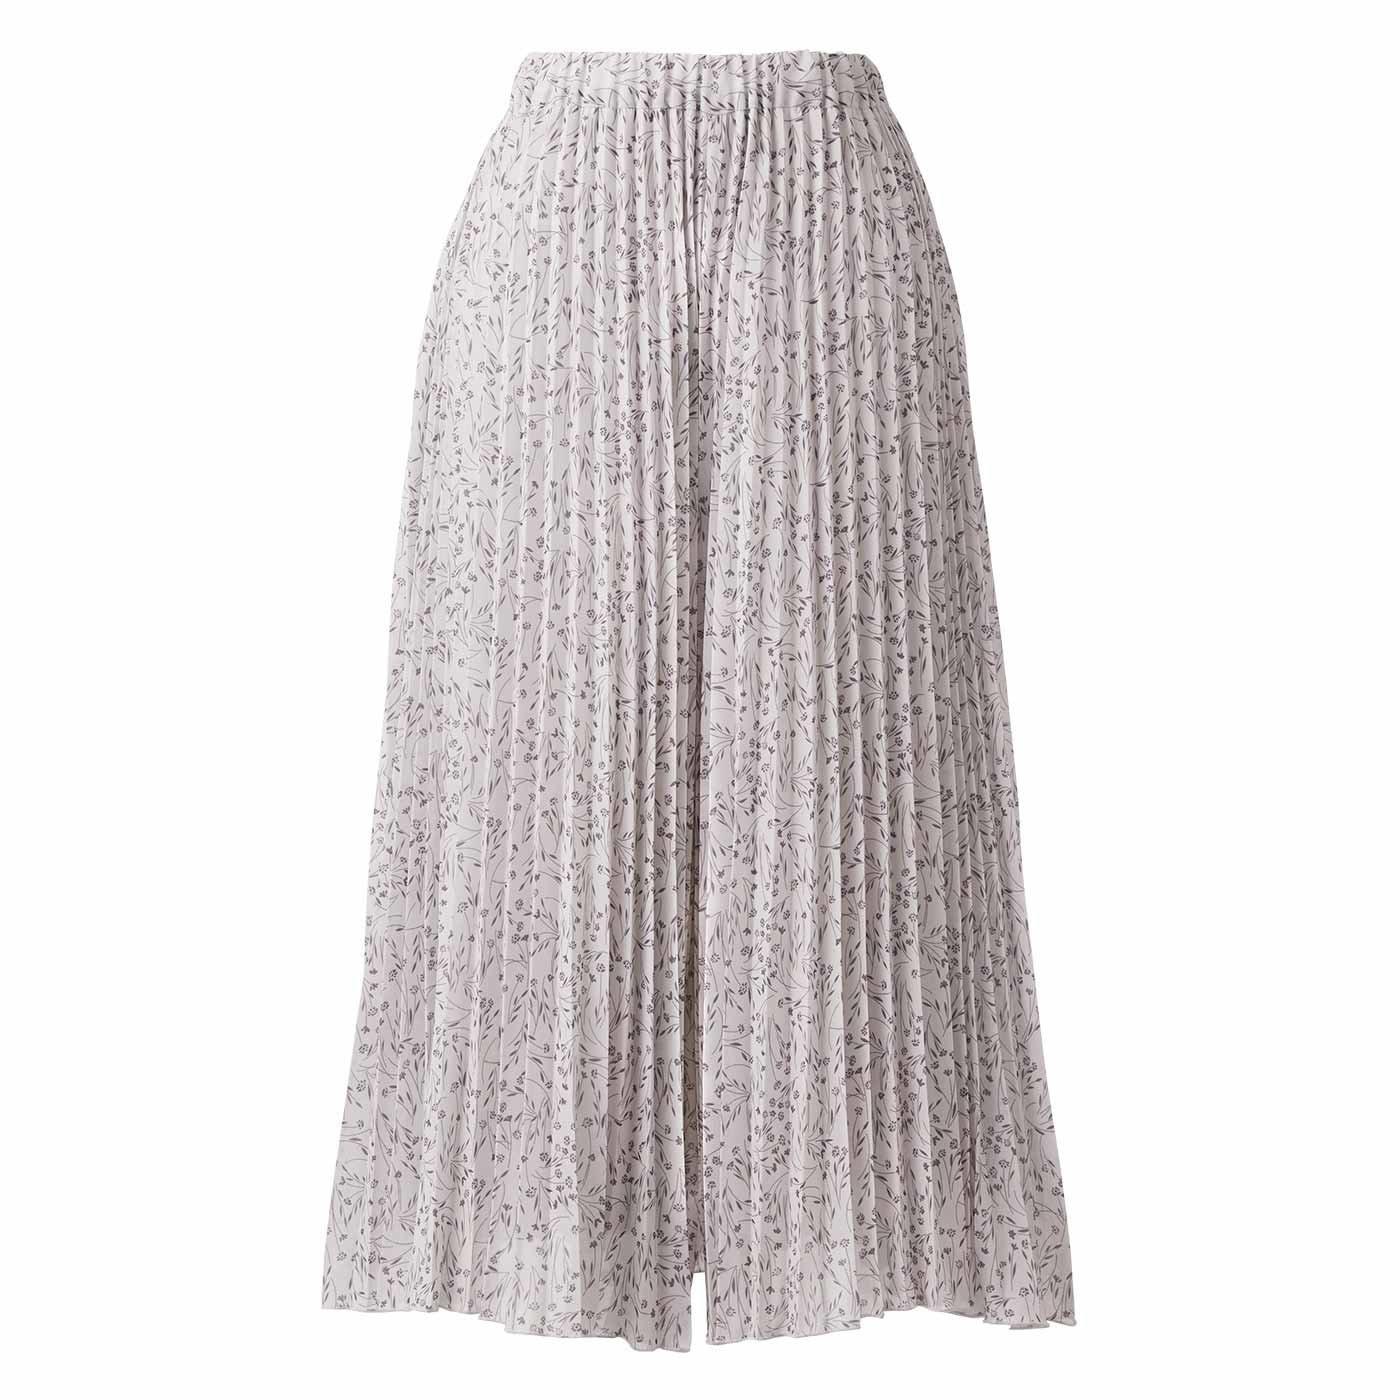 IEDIT[イディット] 吸汗速乾裏地が付いた小柄プリントが上品な プリーツスカート見えパンツ〈ライトグレー〉